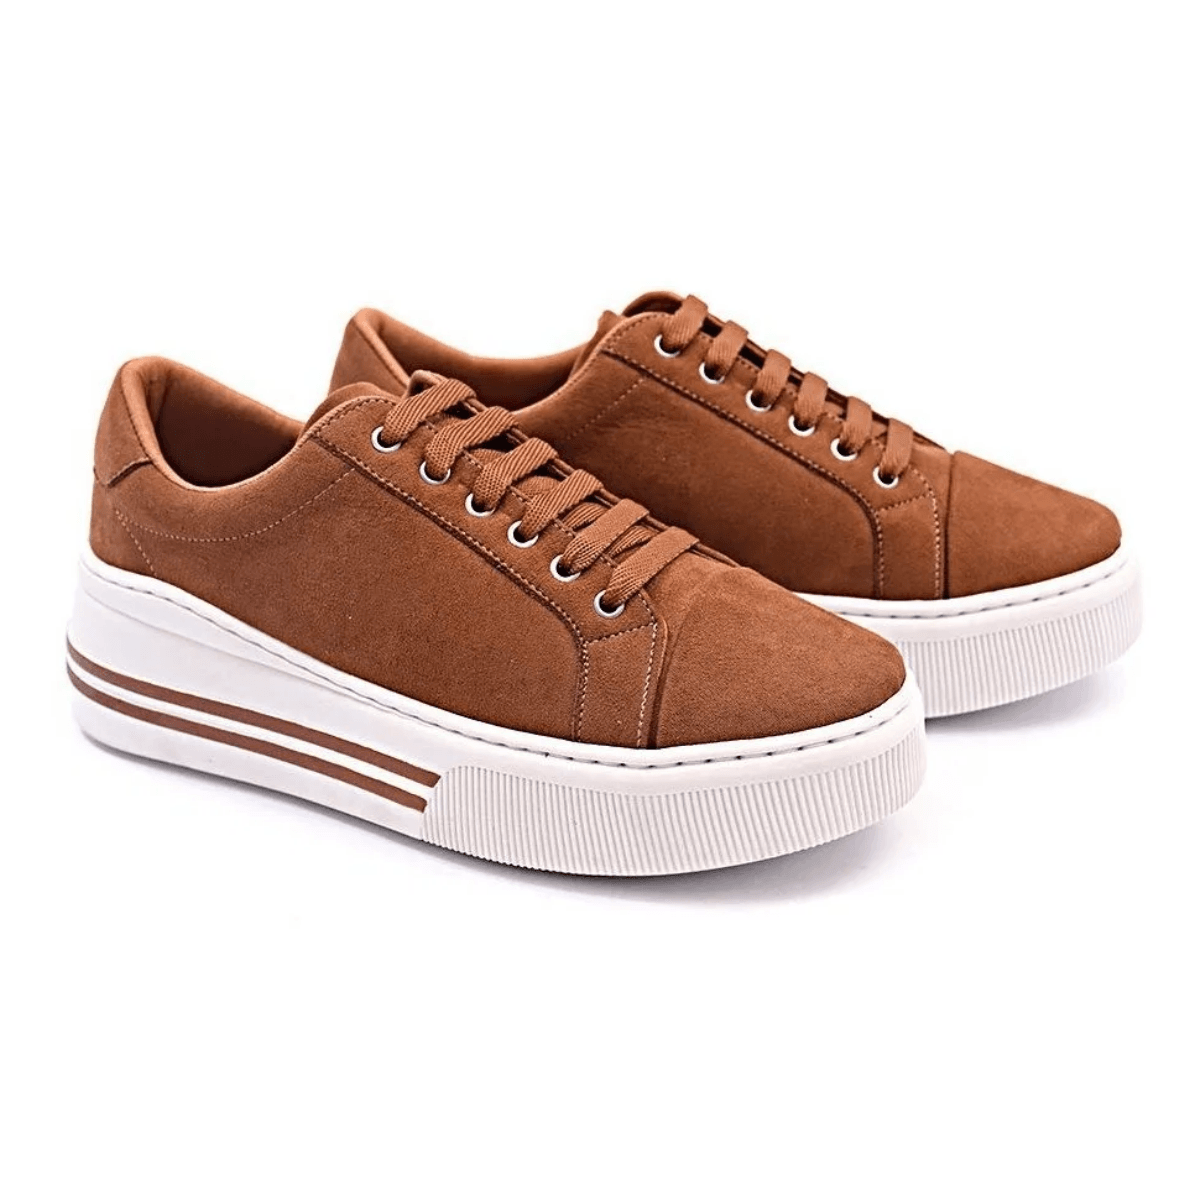 Tênis Casual Gommix Shoes 117 Sola Alta Caramelo